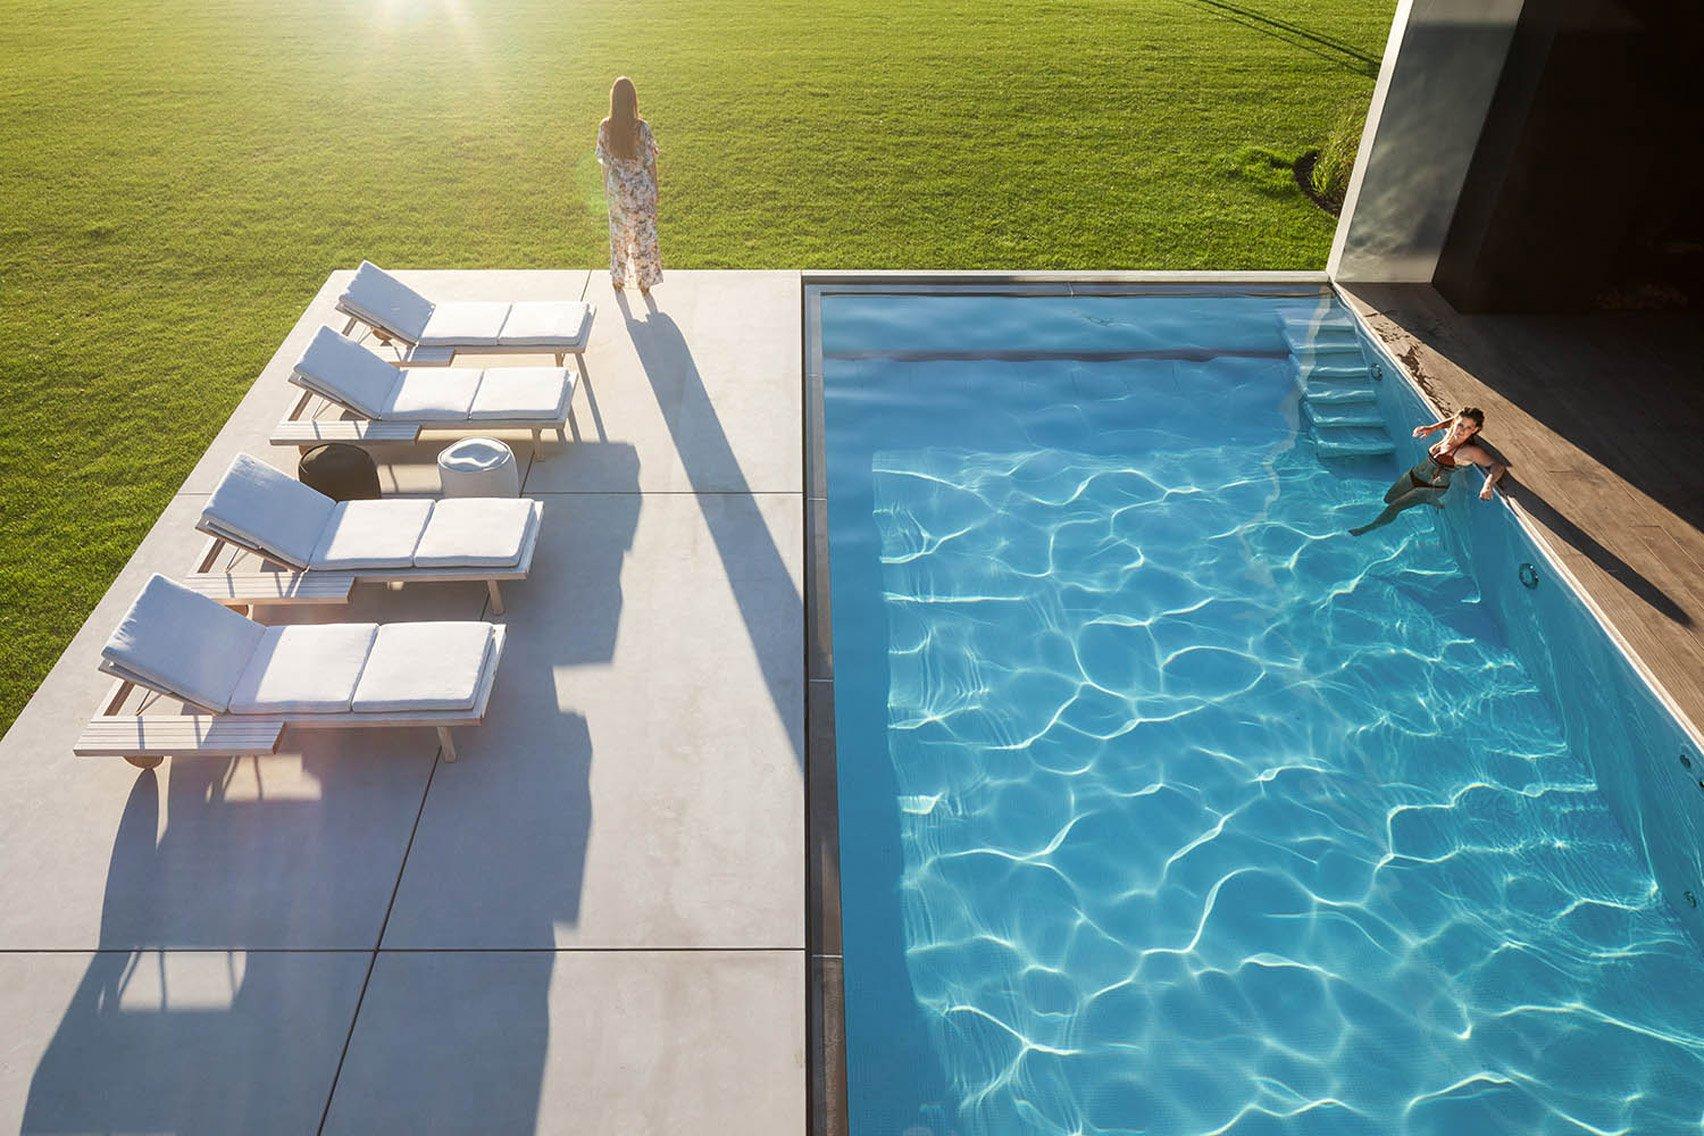 espiar piscina